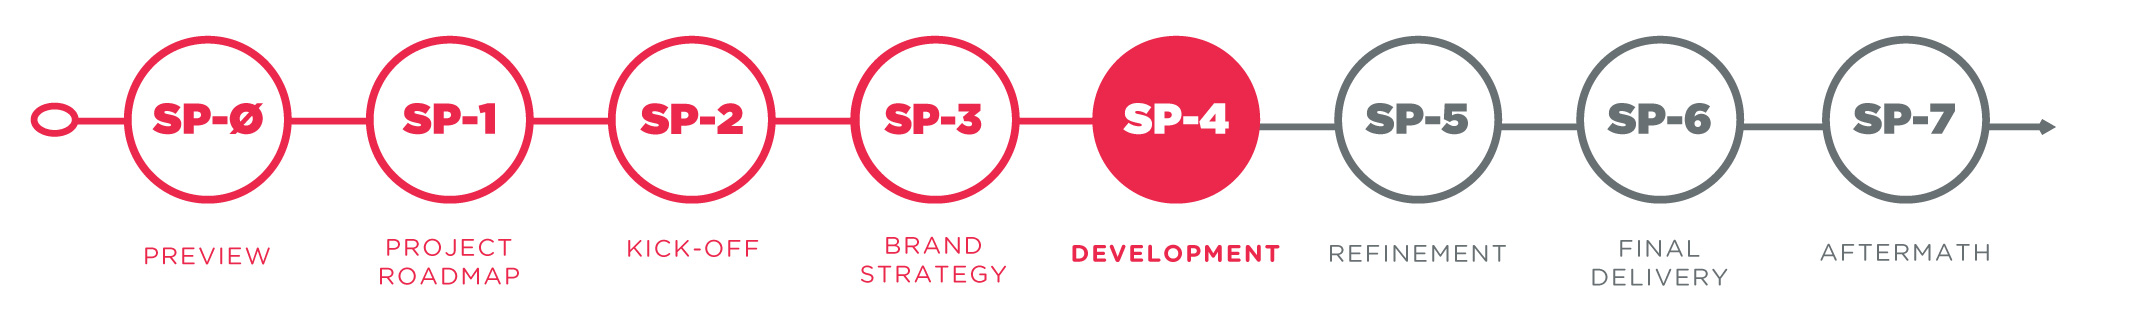 roadmap-marker-conspire-graphic-design.jpg